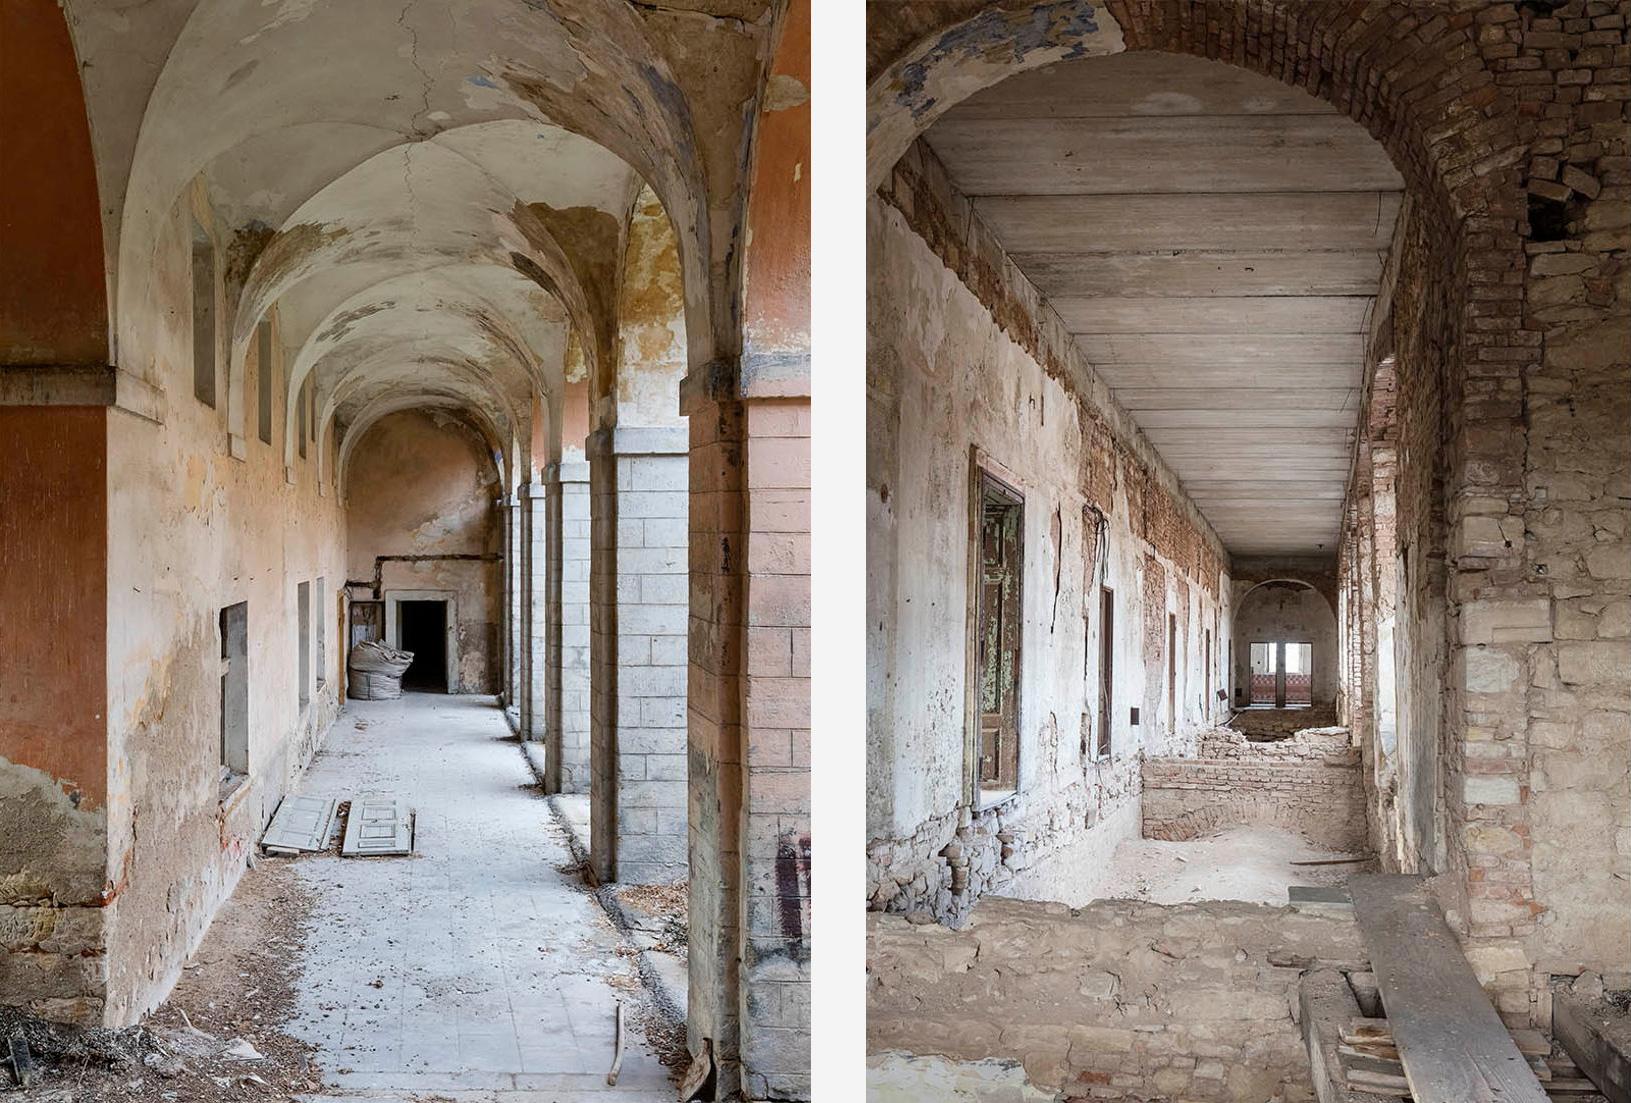 Renovation challenge: a bohemian castle near Prague is ripe for redevelopment